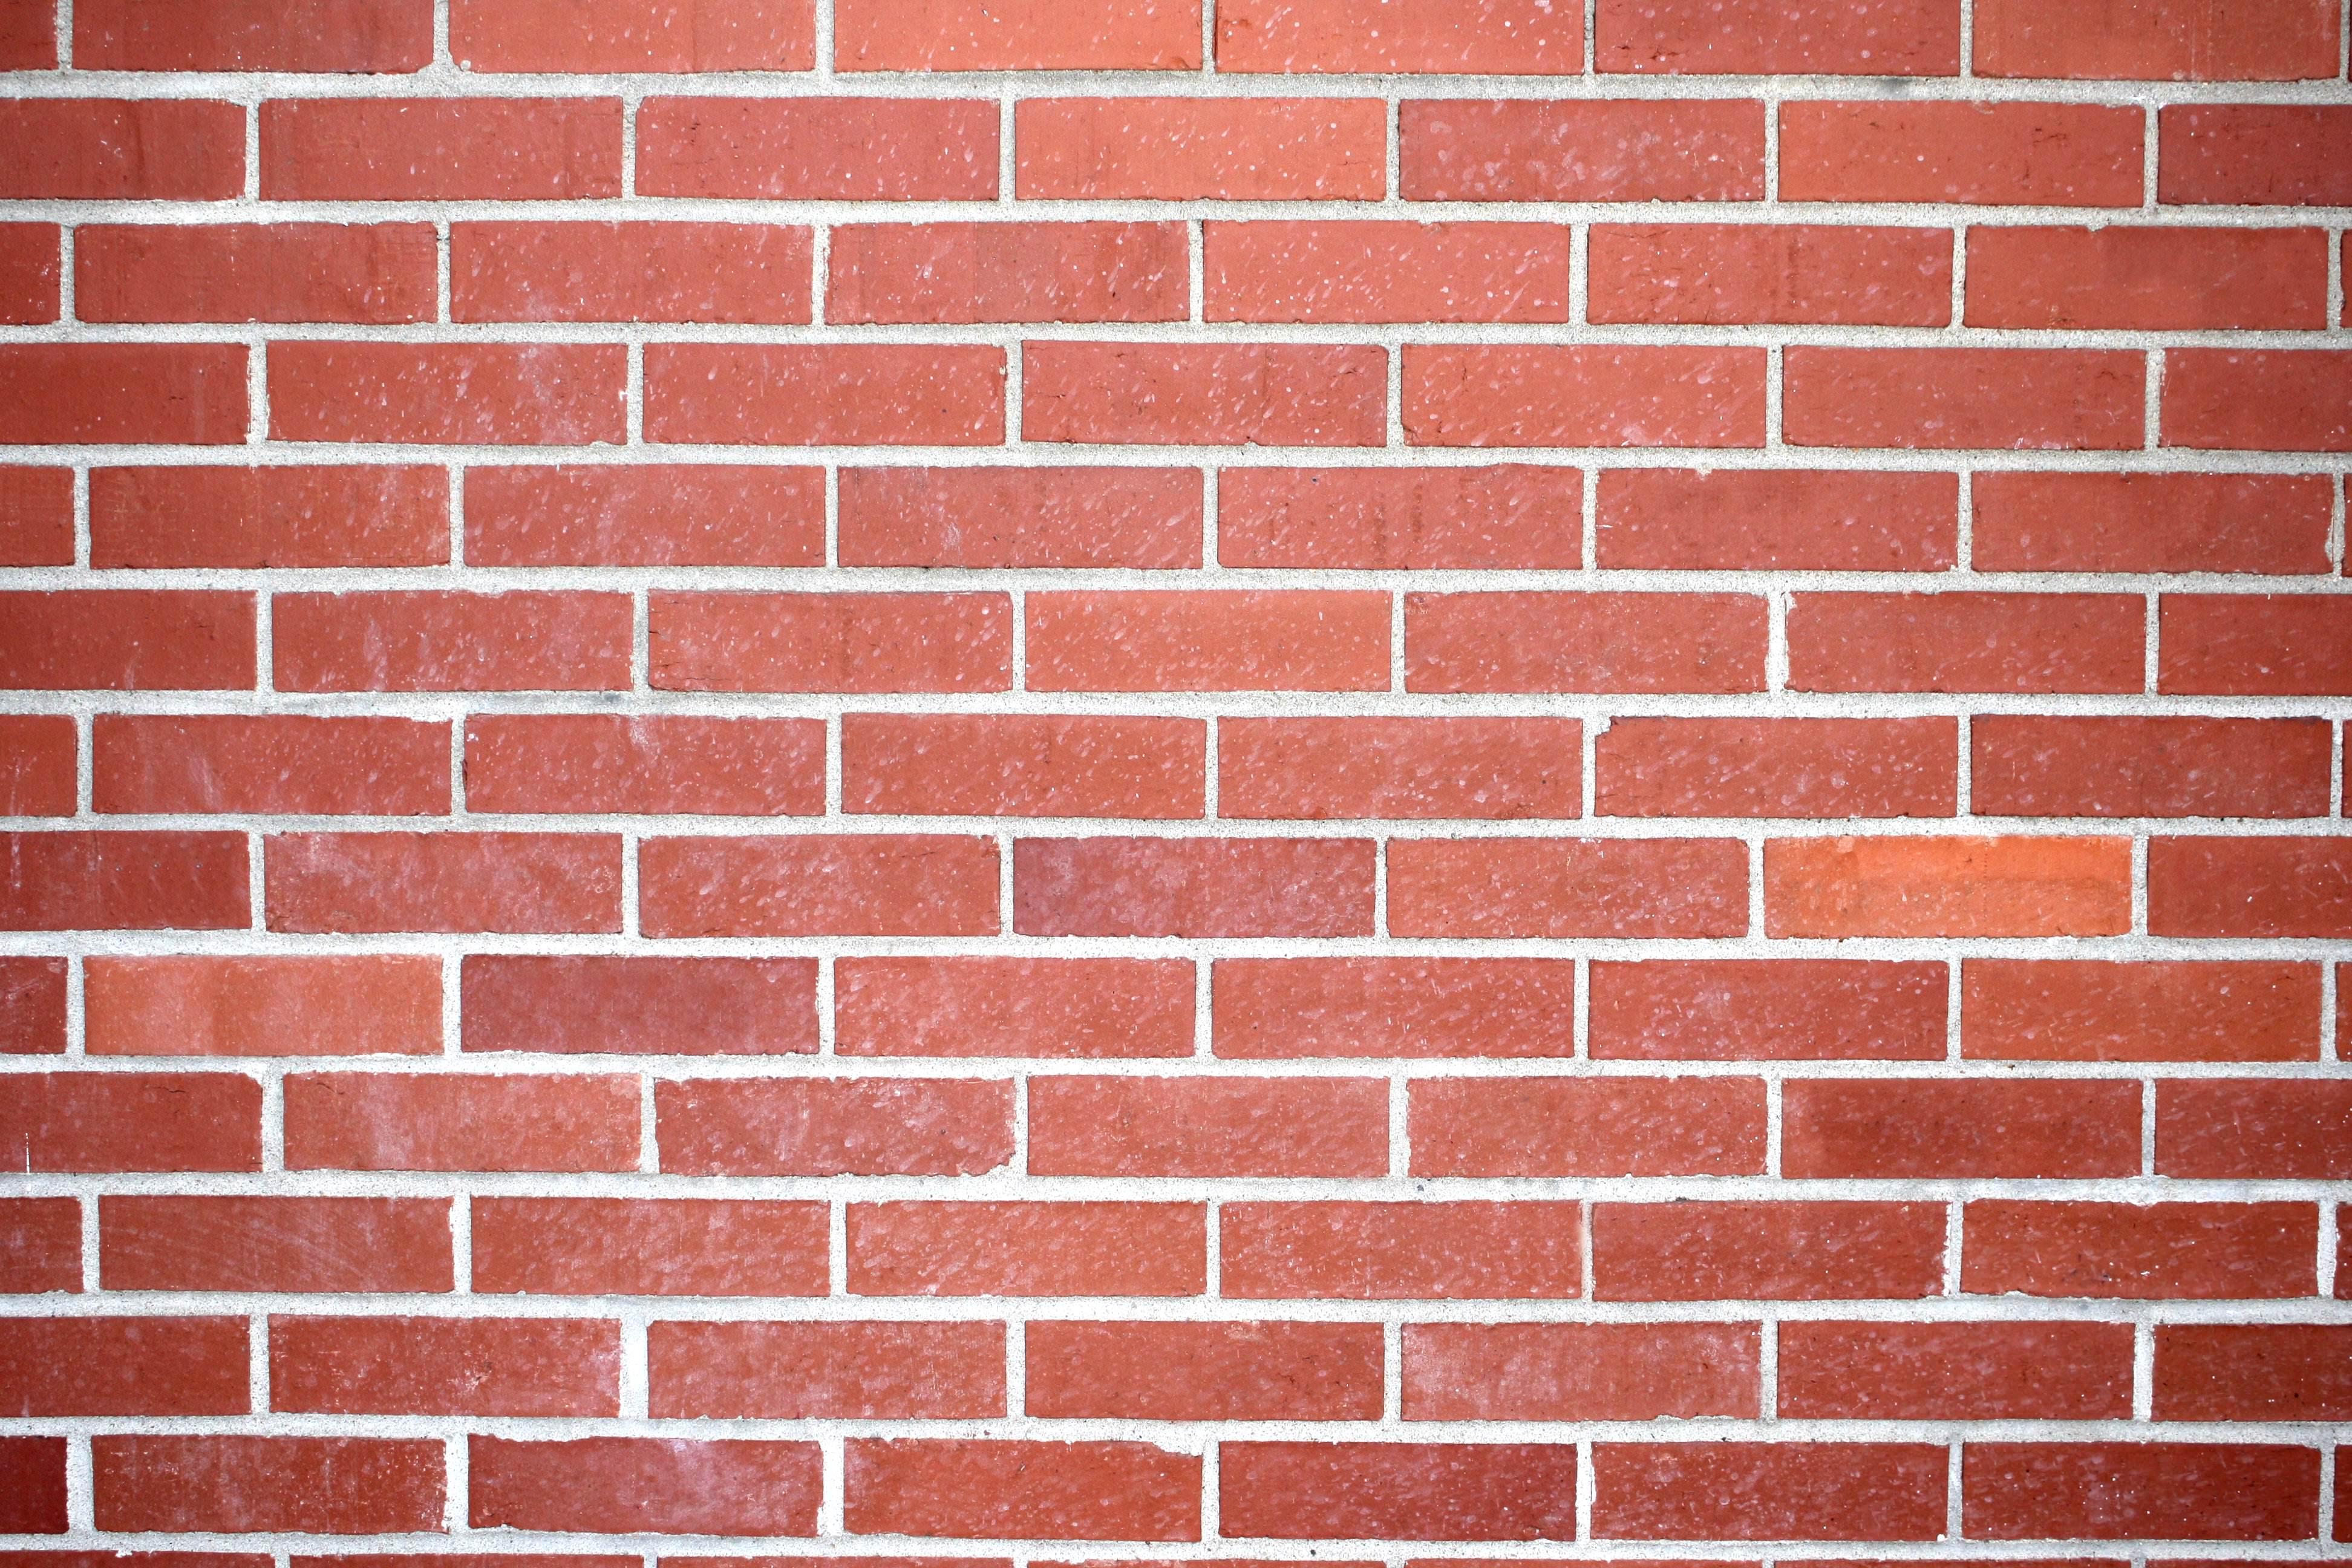 Brick clipart brick wall background  JPG brick Brick EPS